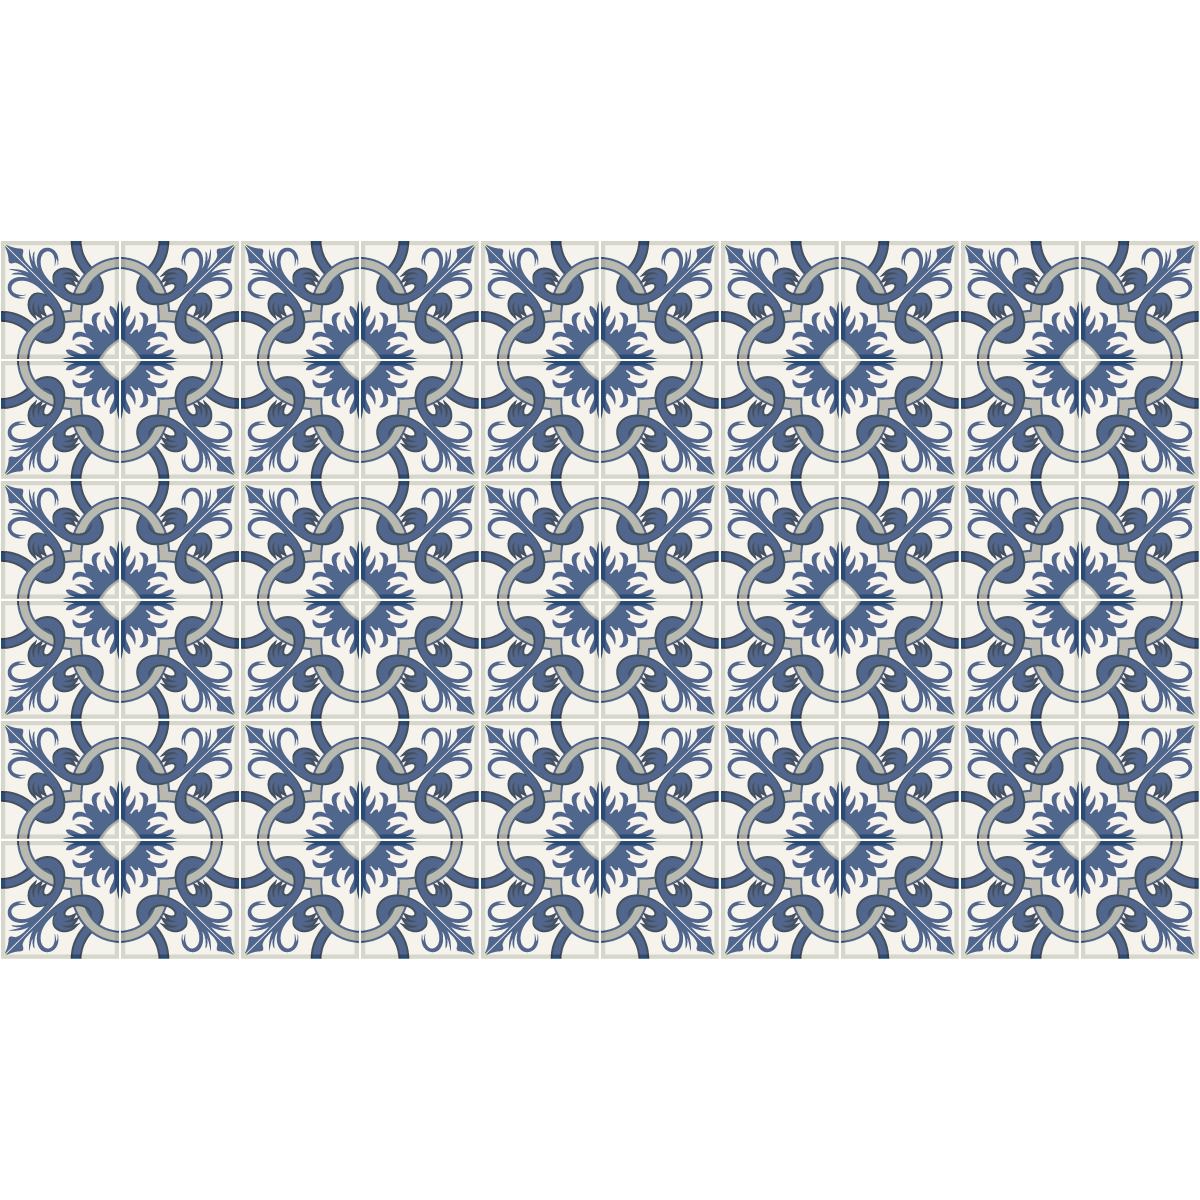 60 stickers carrelages azulejos tonio salle de bain et. Black Bedroom Furniture Sets. Home Design Ideas